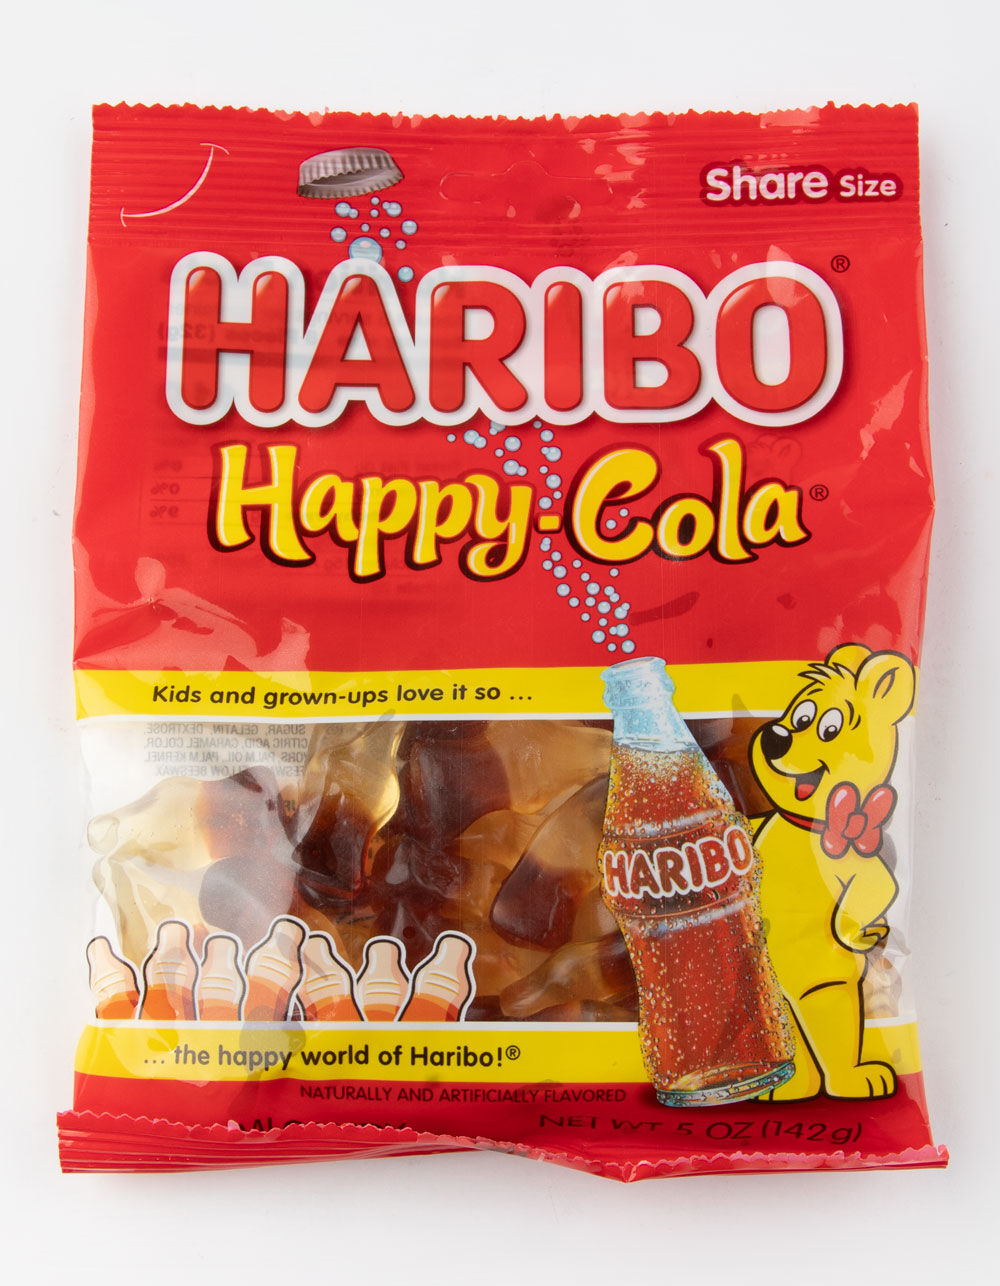 HARIBO Happy Cola Candy